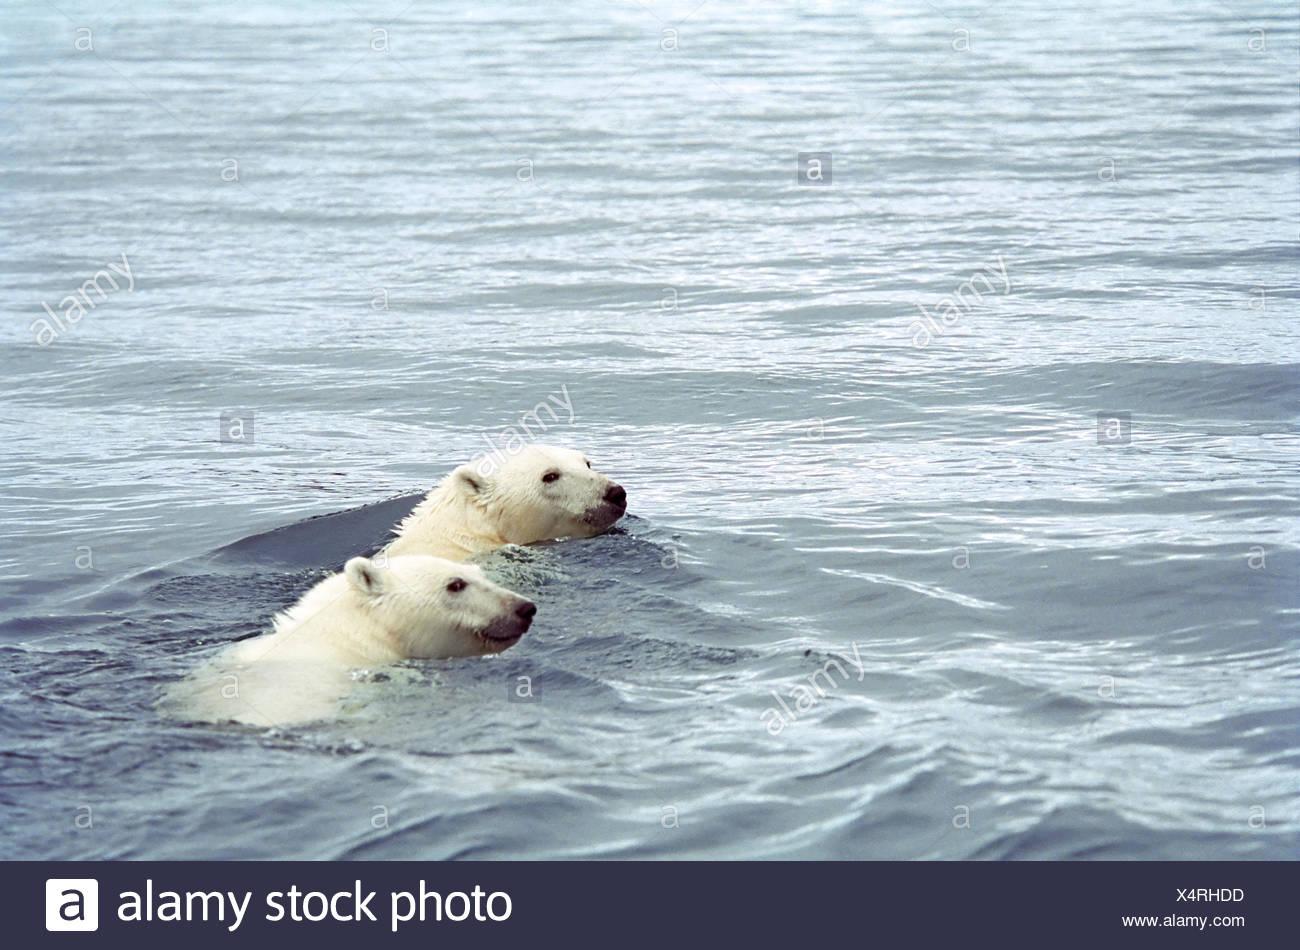 Polar bear mother and cub, Ursus maritimus,  swimming in Wager Bay, Ukkusiksalik National Park, Nunavut - Stock Image